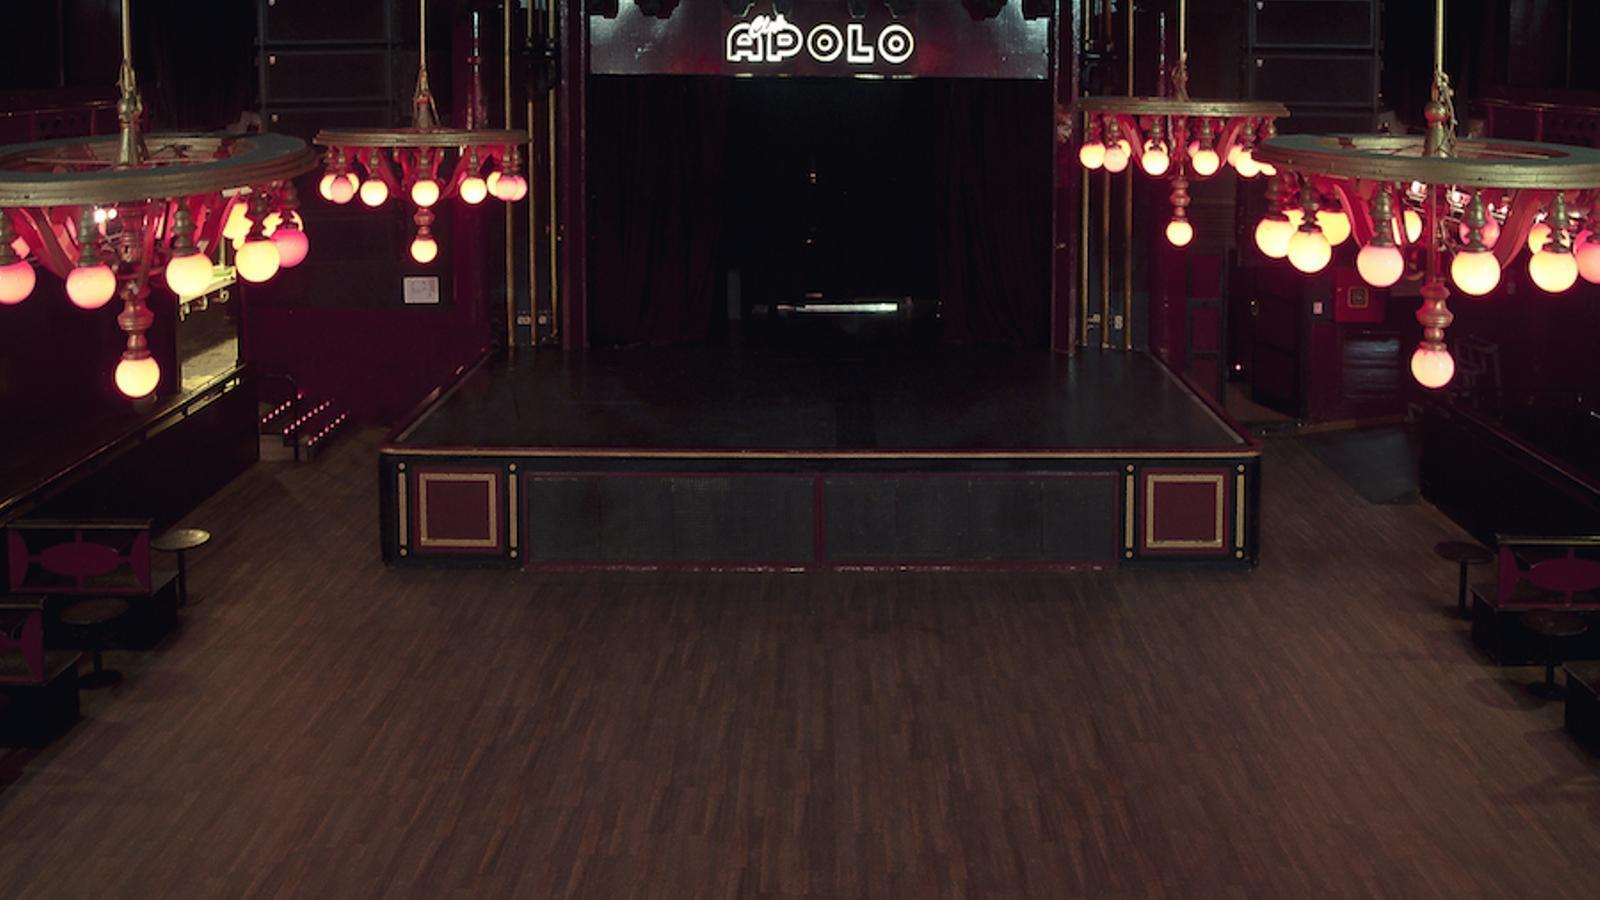 La Sala Apolo de Barcelona / APOLO